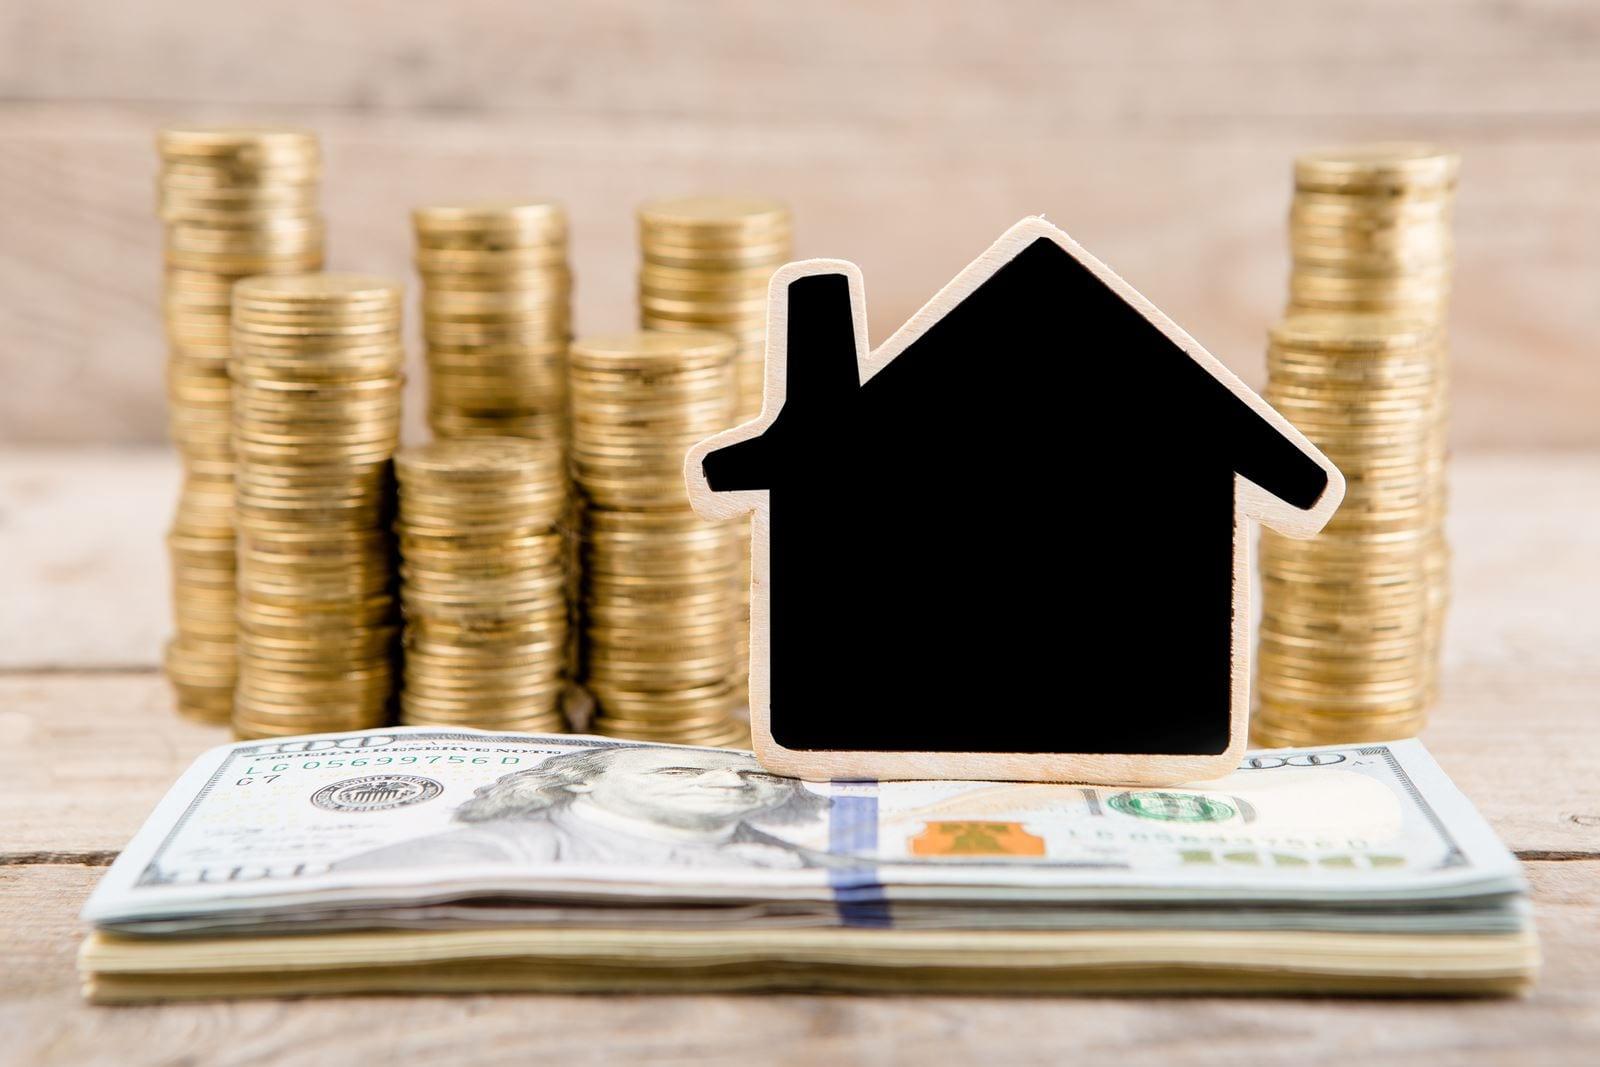 Investing in Rental Properties in 2019: The Beginner's Guide